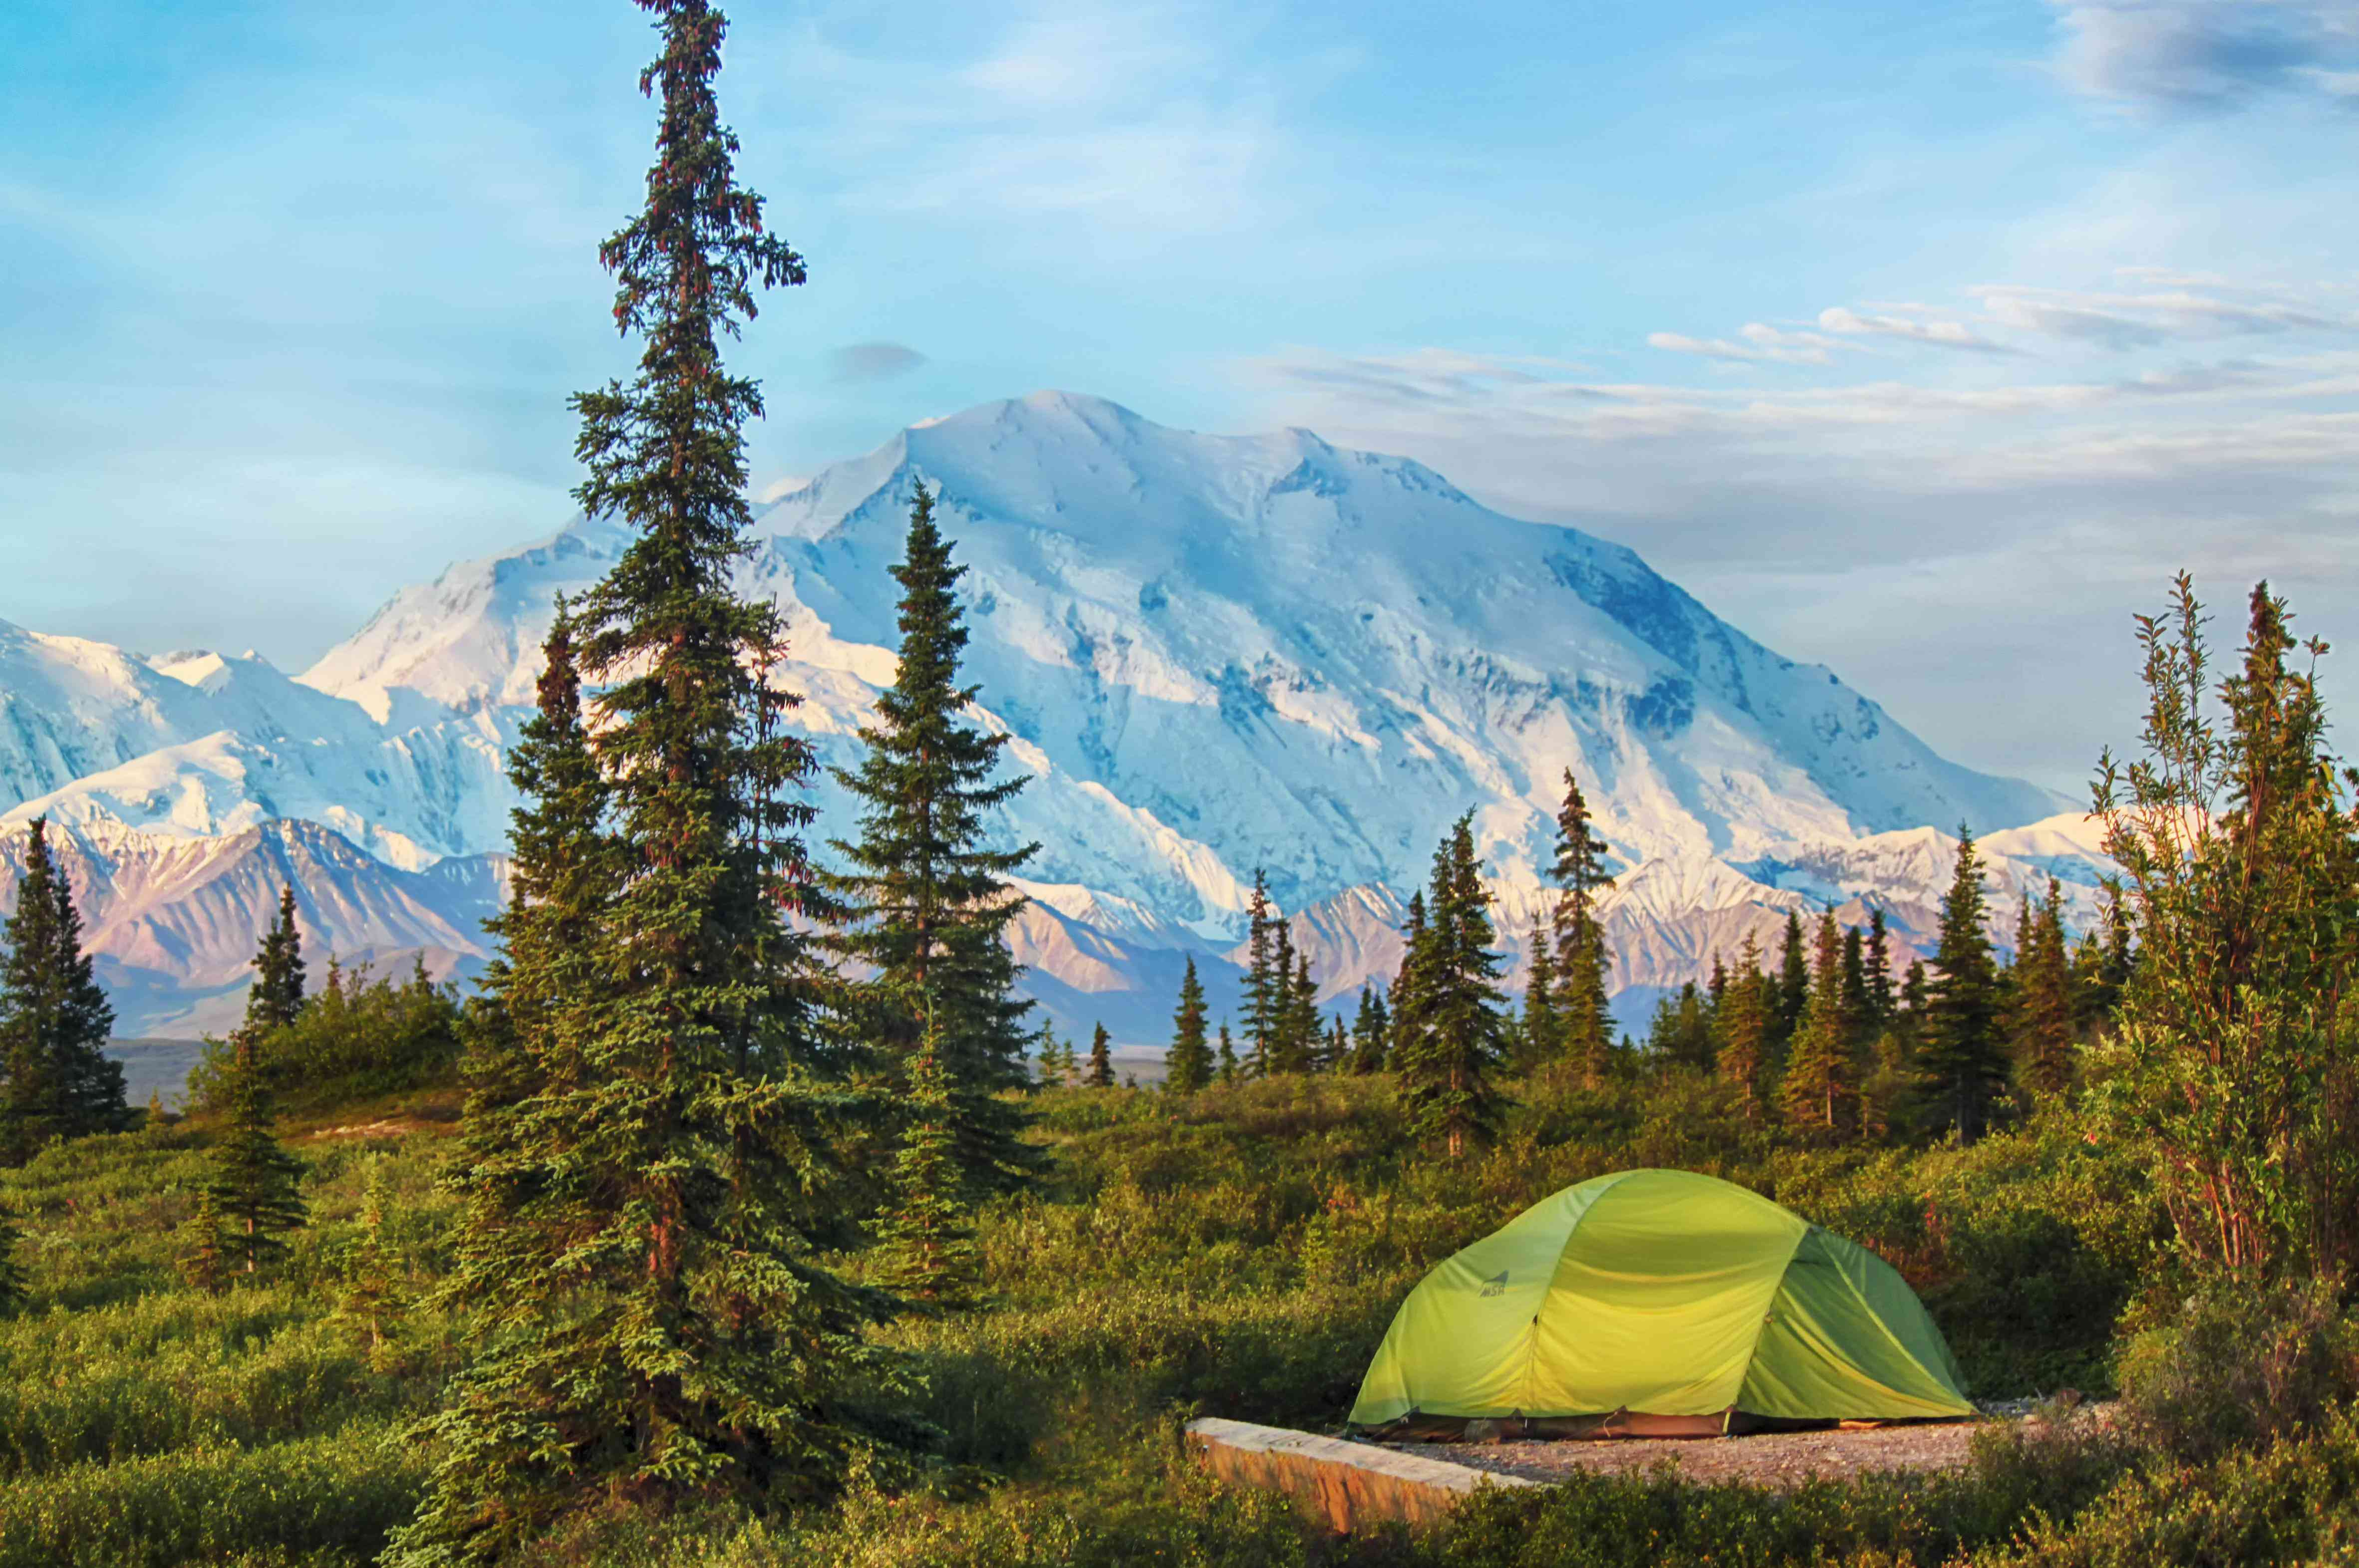 Camping in Denali National Park, Alaska, USA